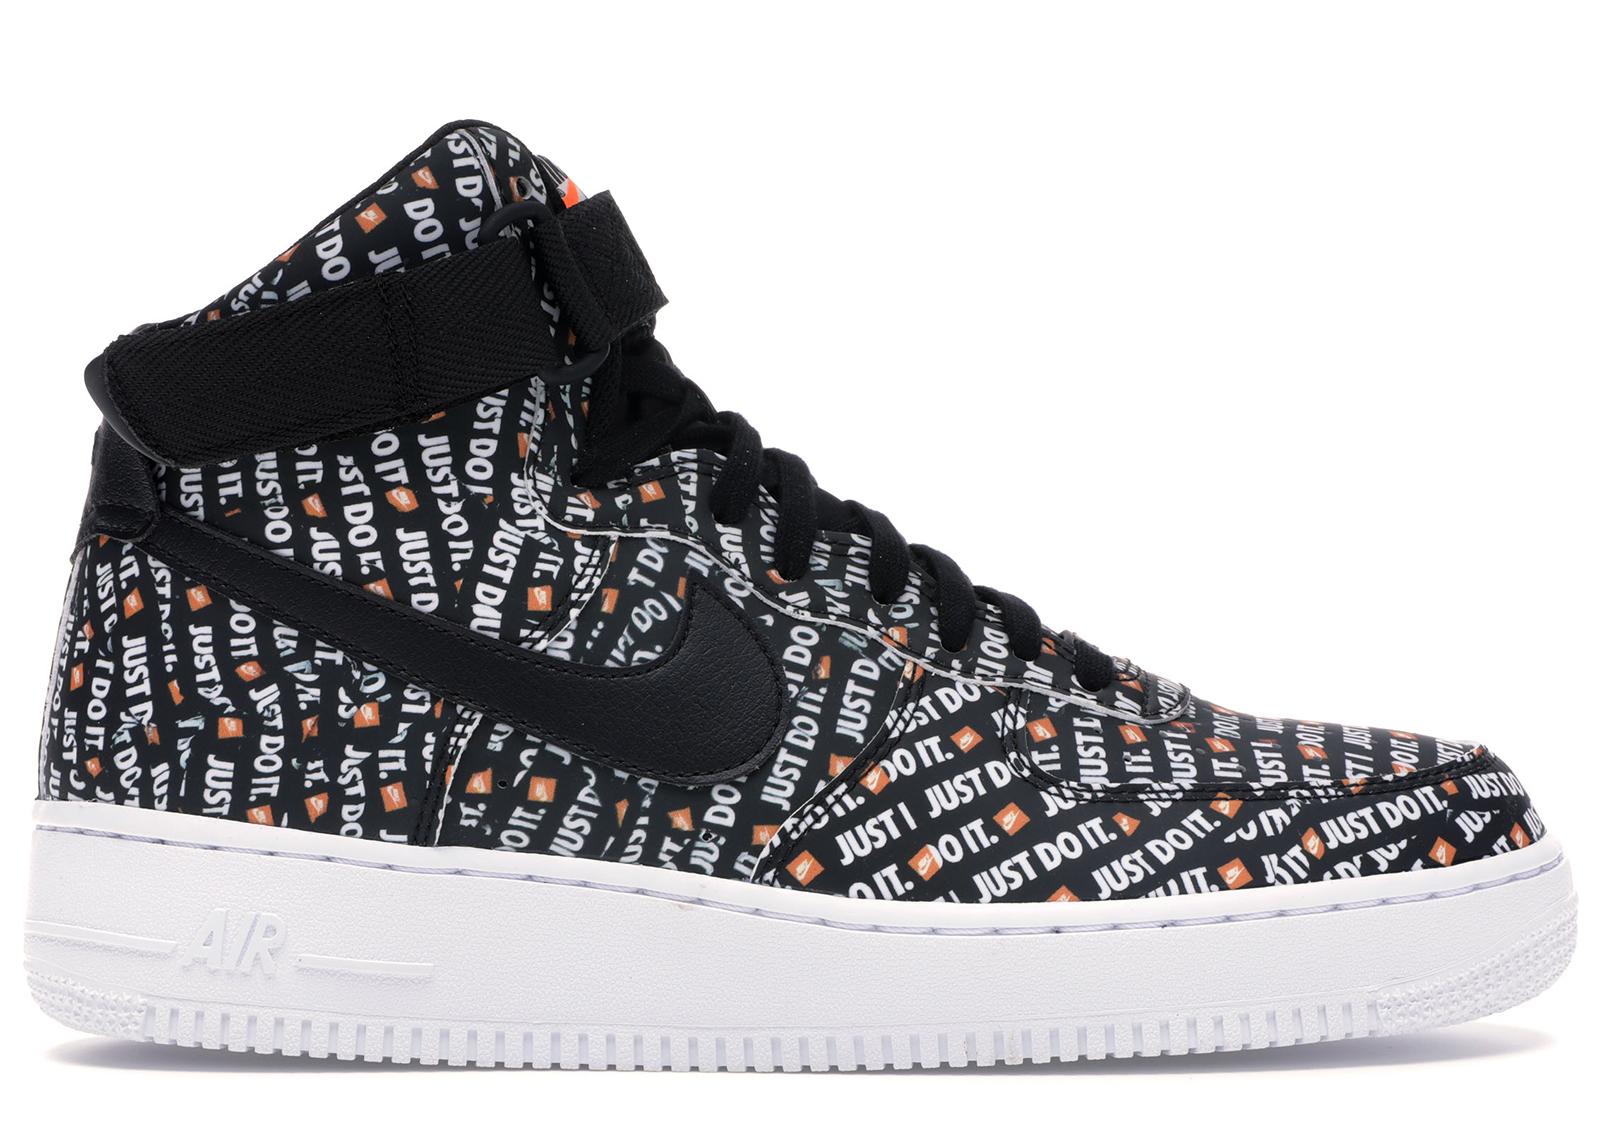 Nike Air Force 1 High Just Do It Pack Black - AQ9648-001